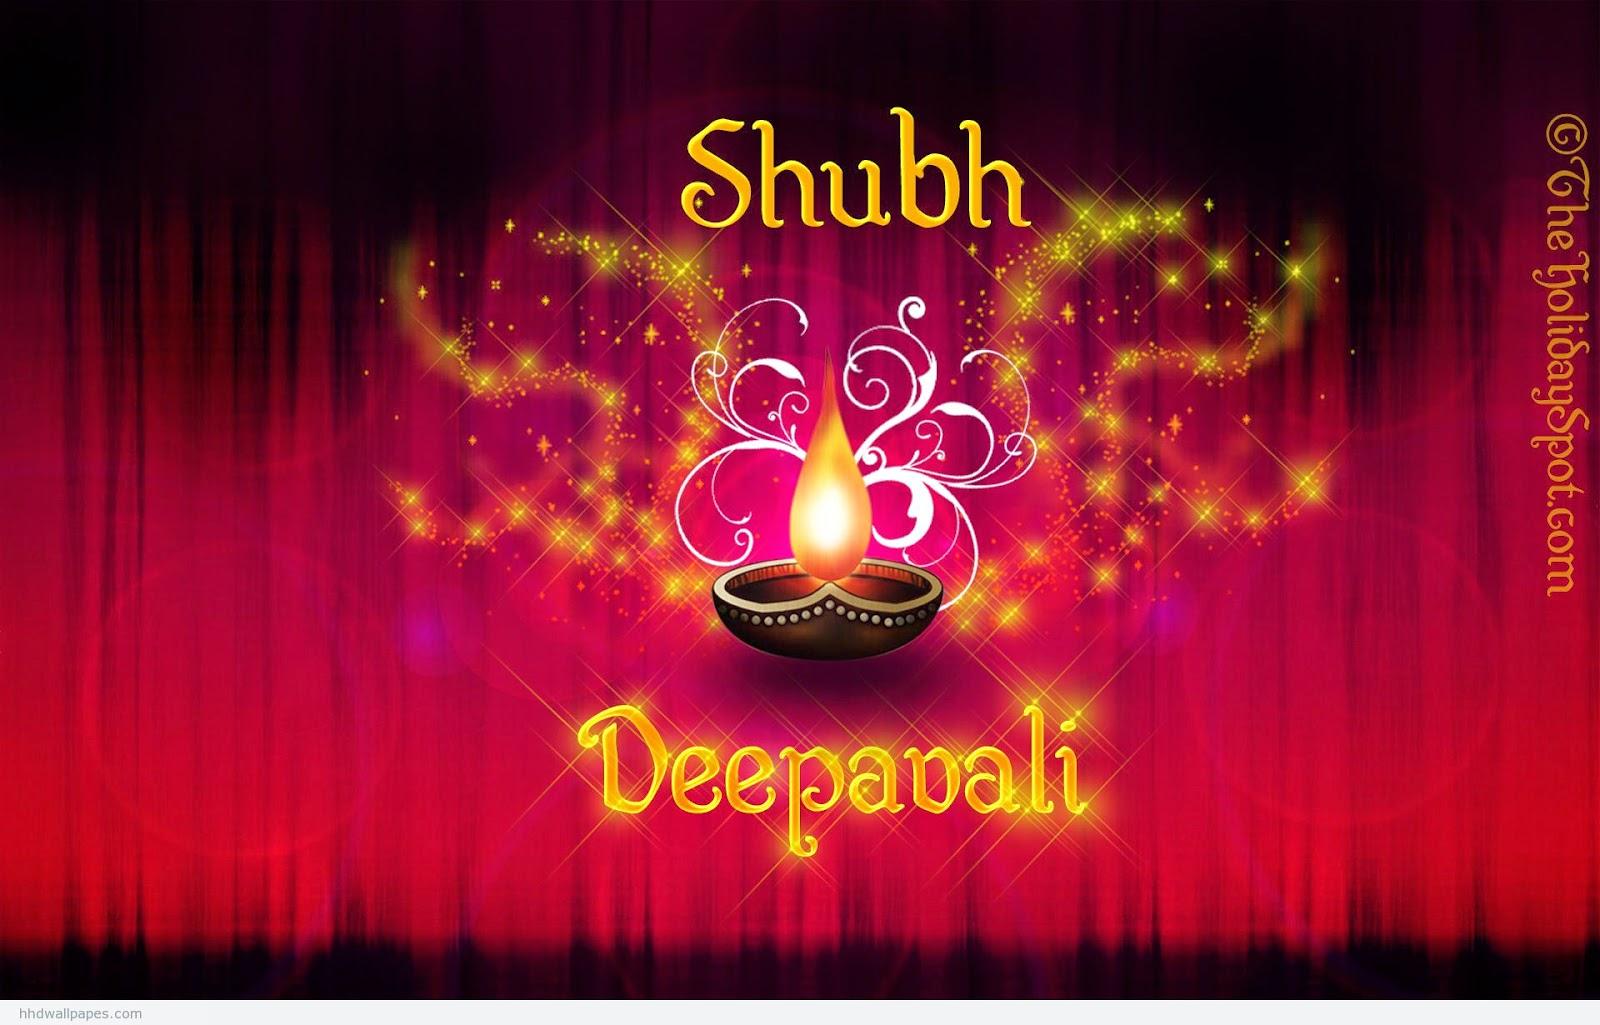 Diwali Images 2014